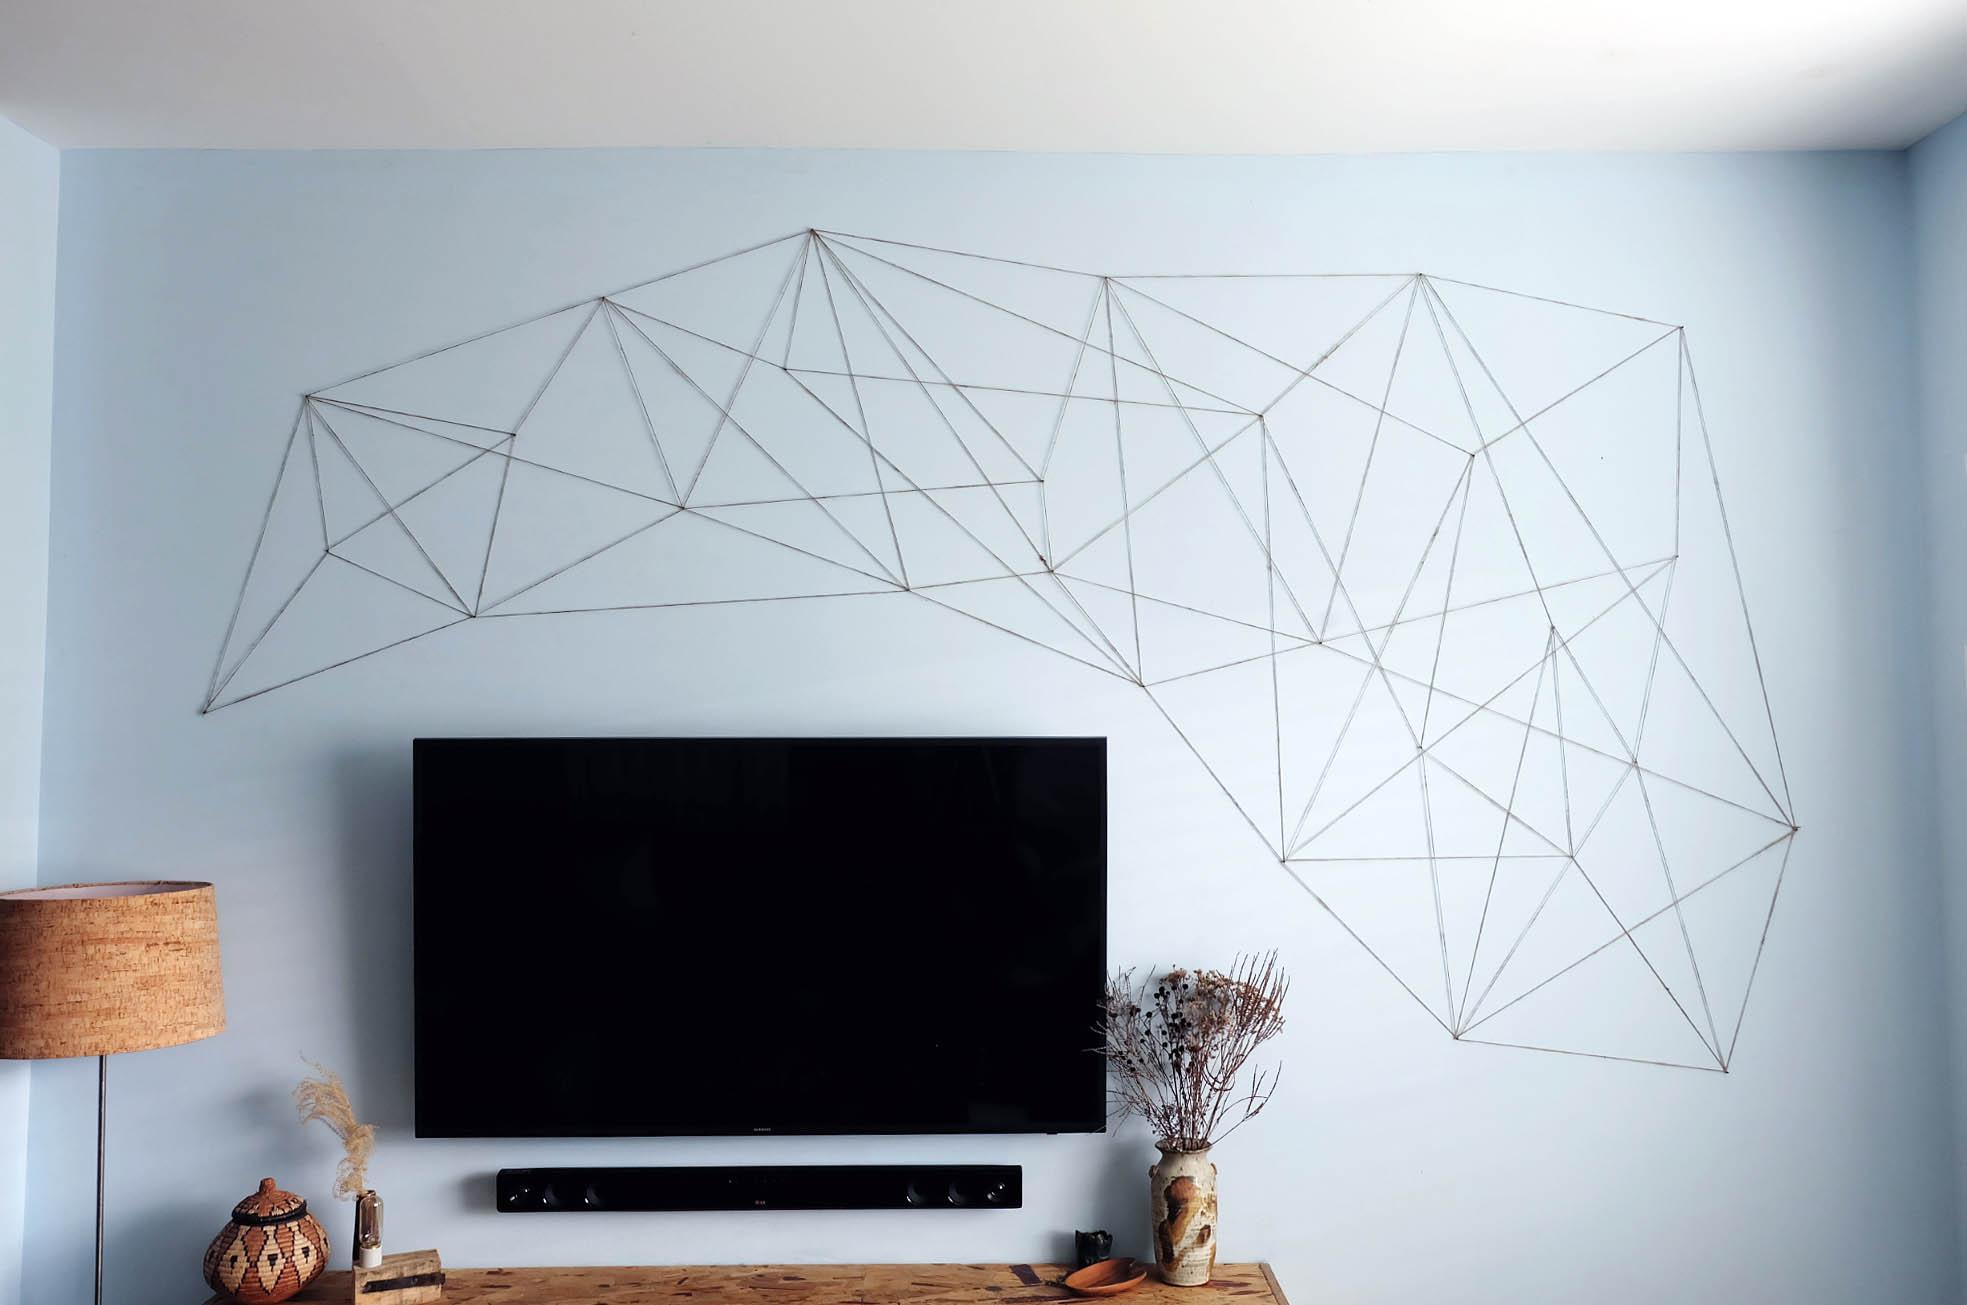 art string decor diy design wall hanging mid-century boho